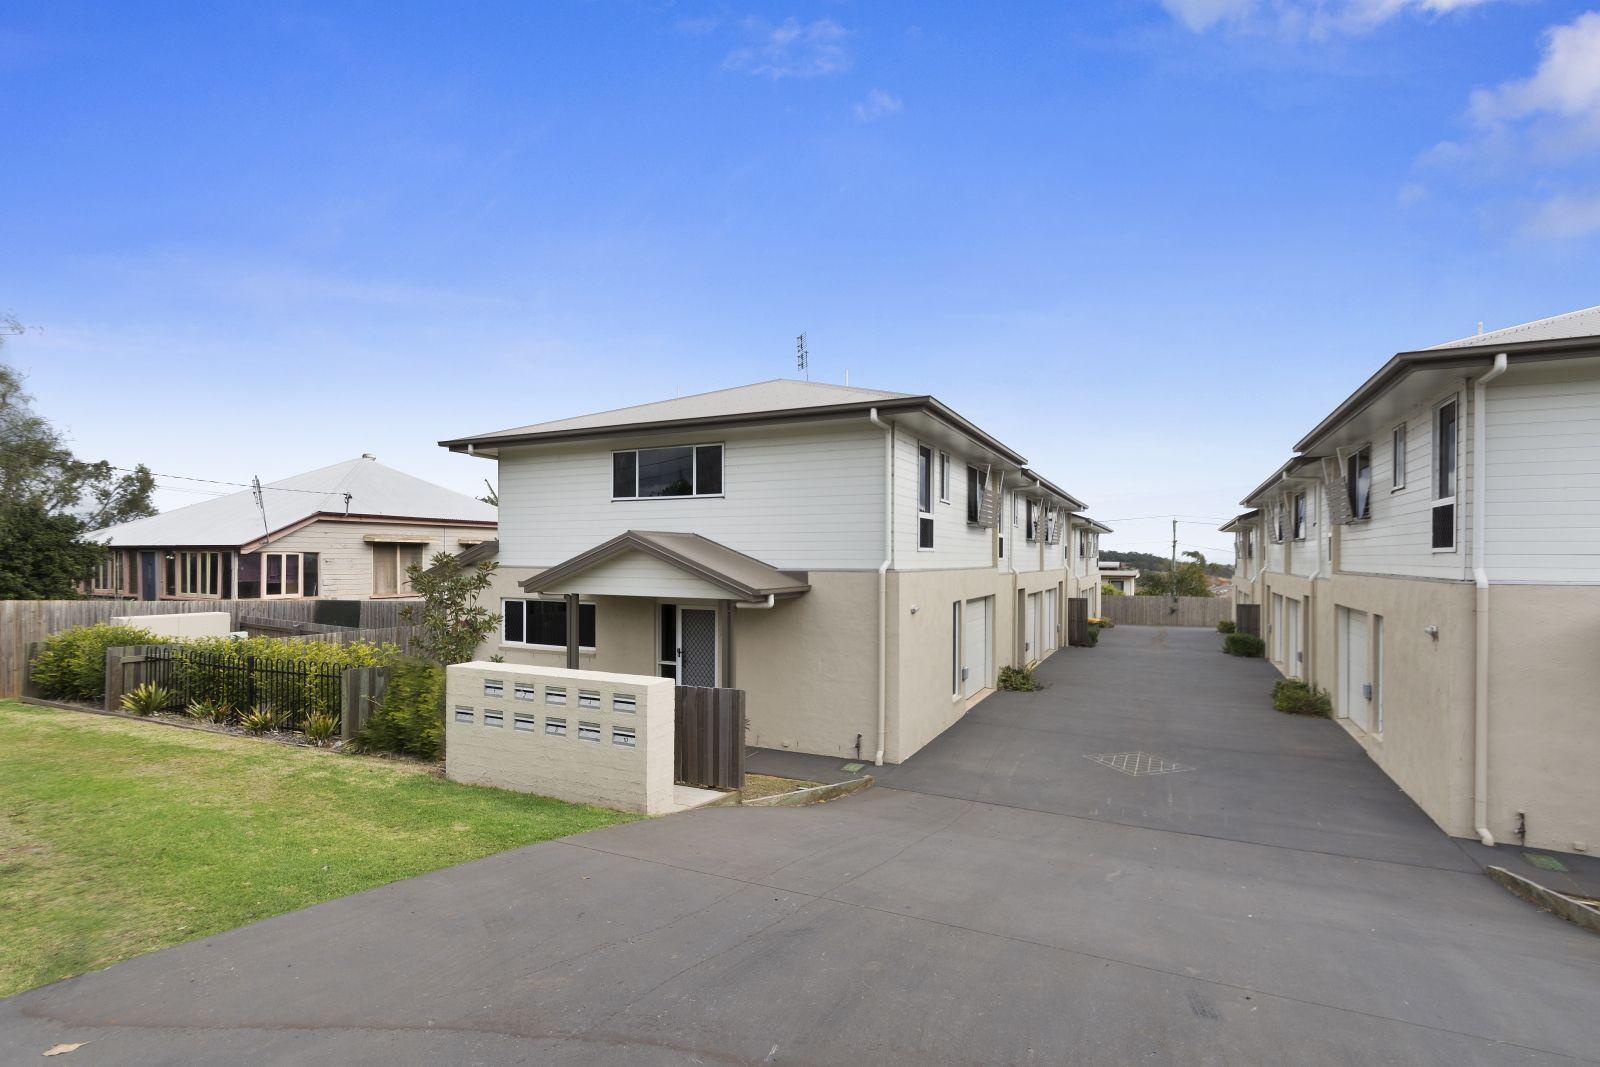 6/11 O'Brien Street, Toowoomba QLD 4350, Image 0